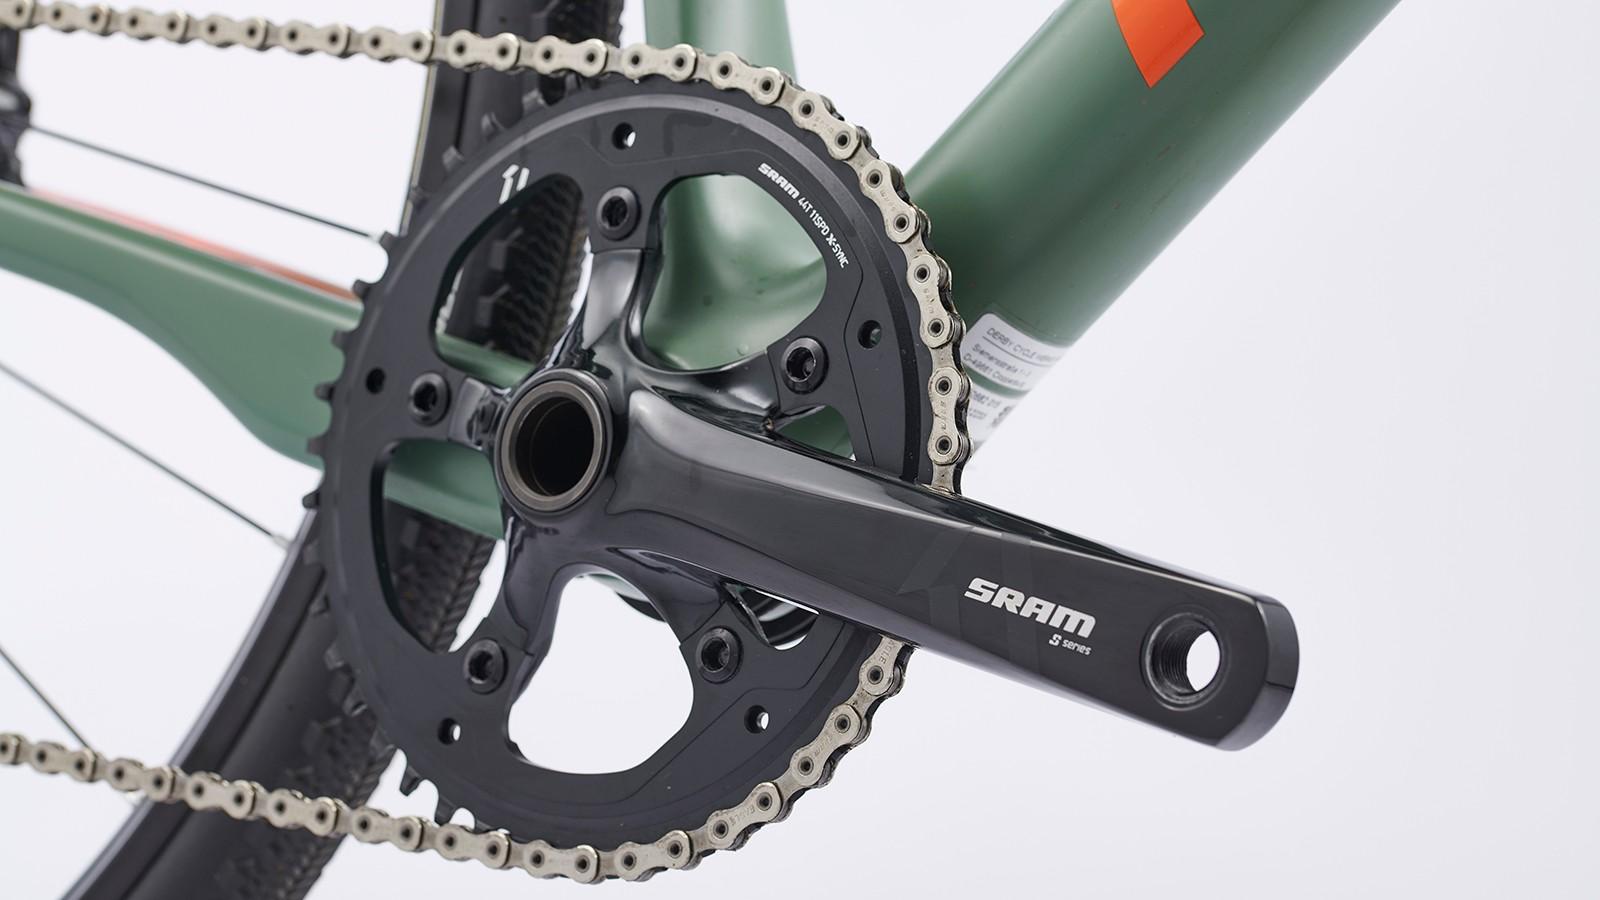 44t chainring SRAM crank